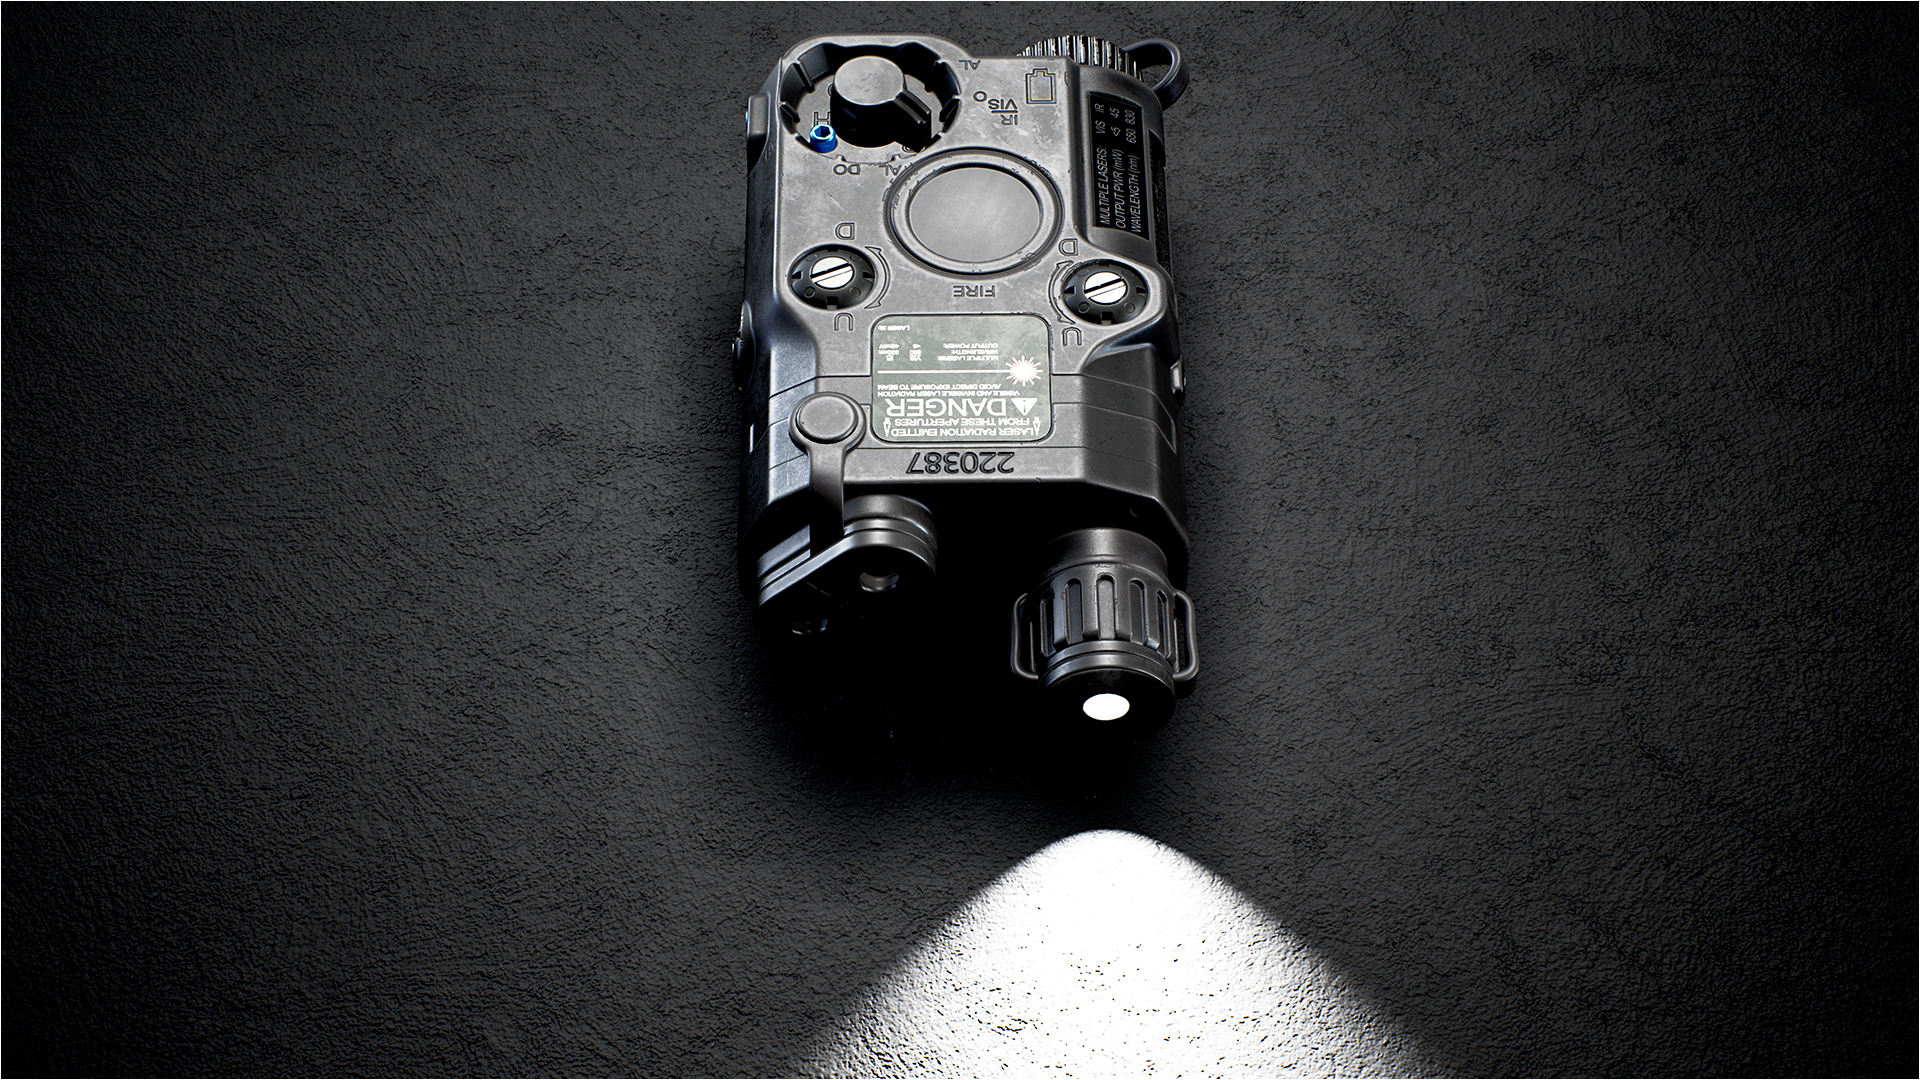 Lasersight/Infrared Laser and Infrared Illuminator